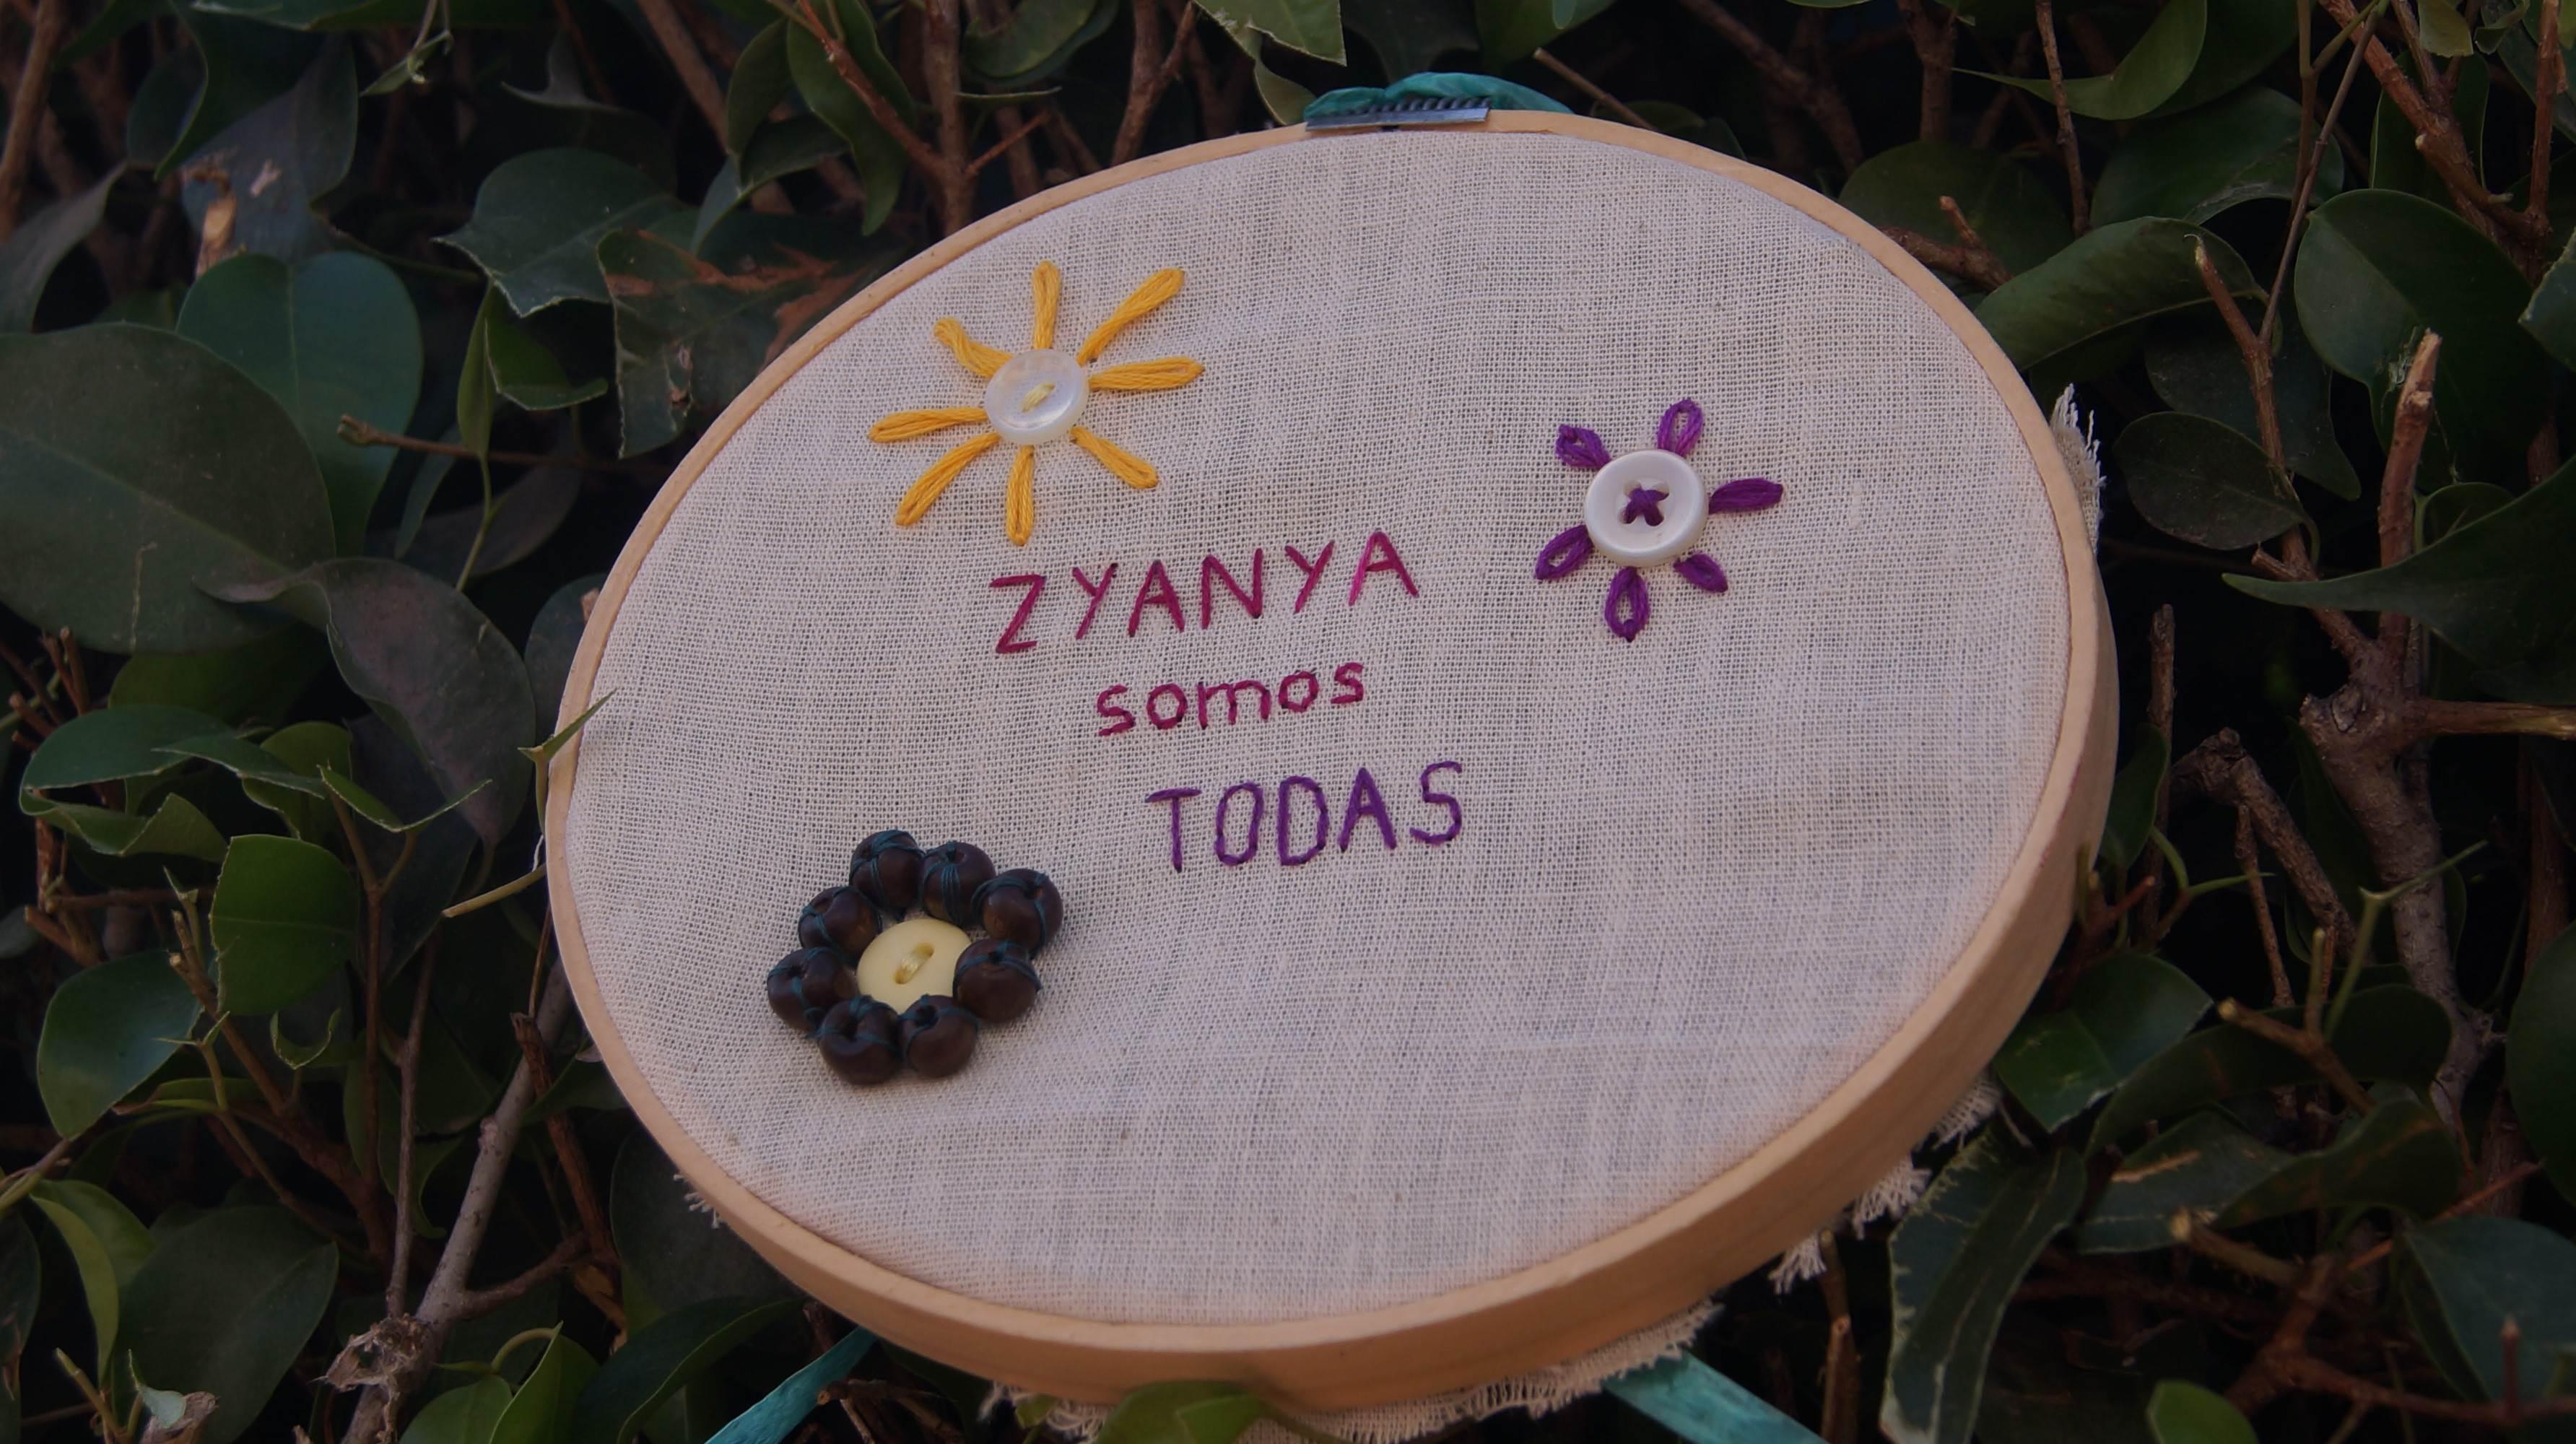 Zyanya Figueroa Becerril